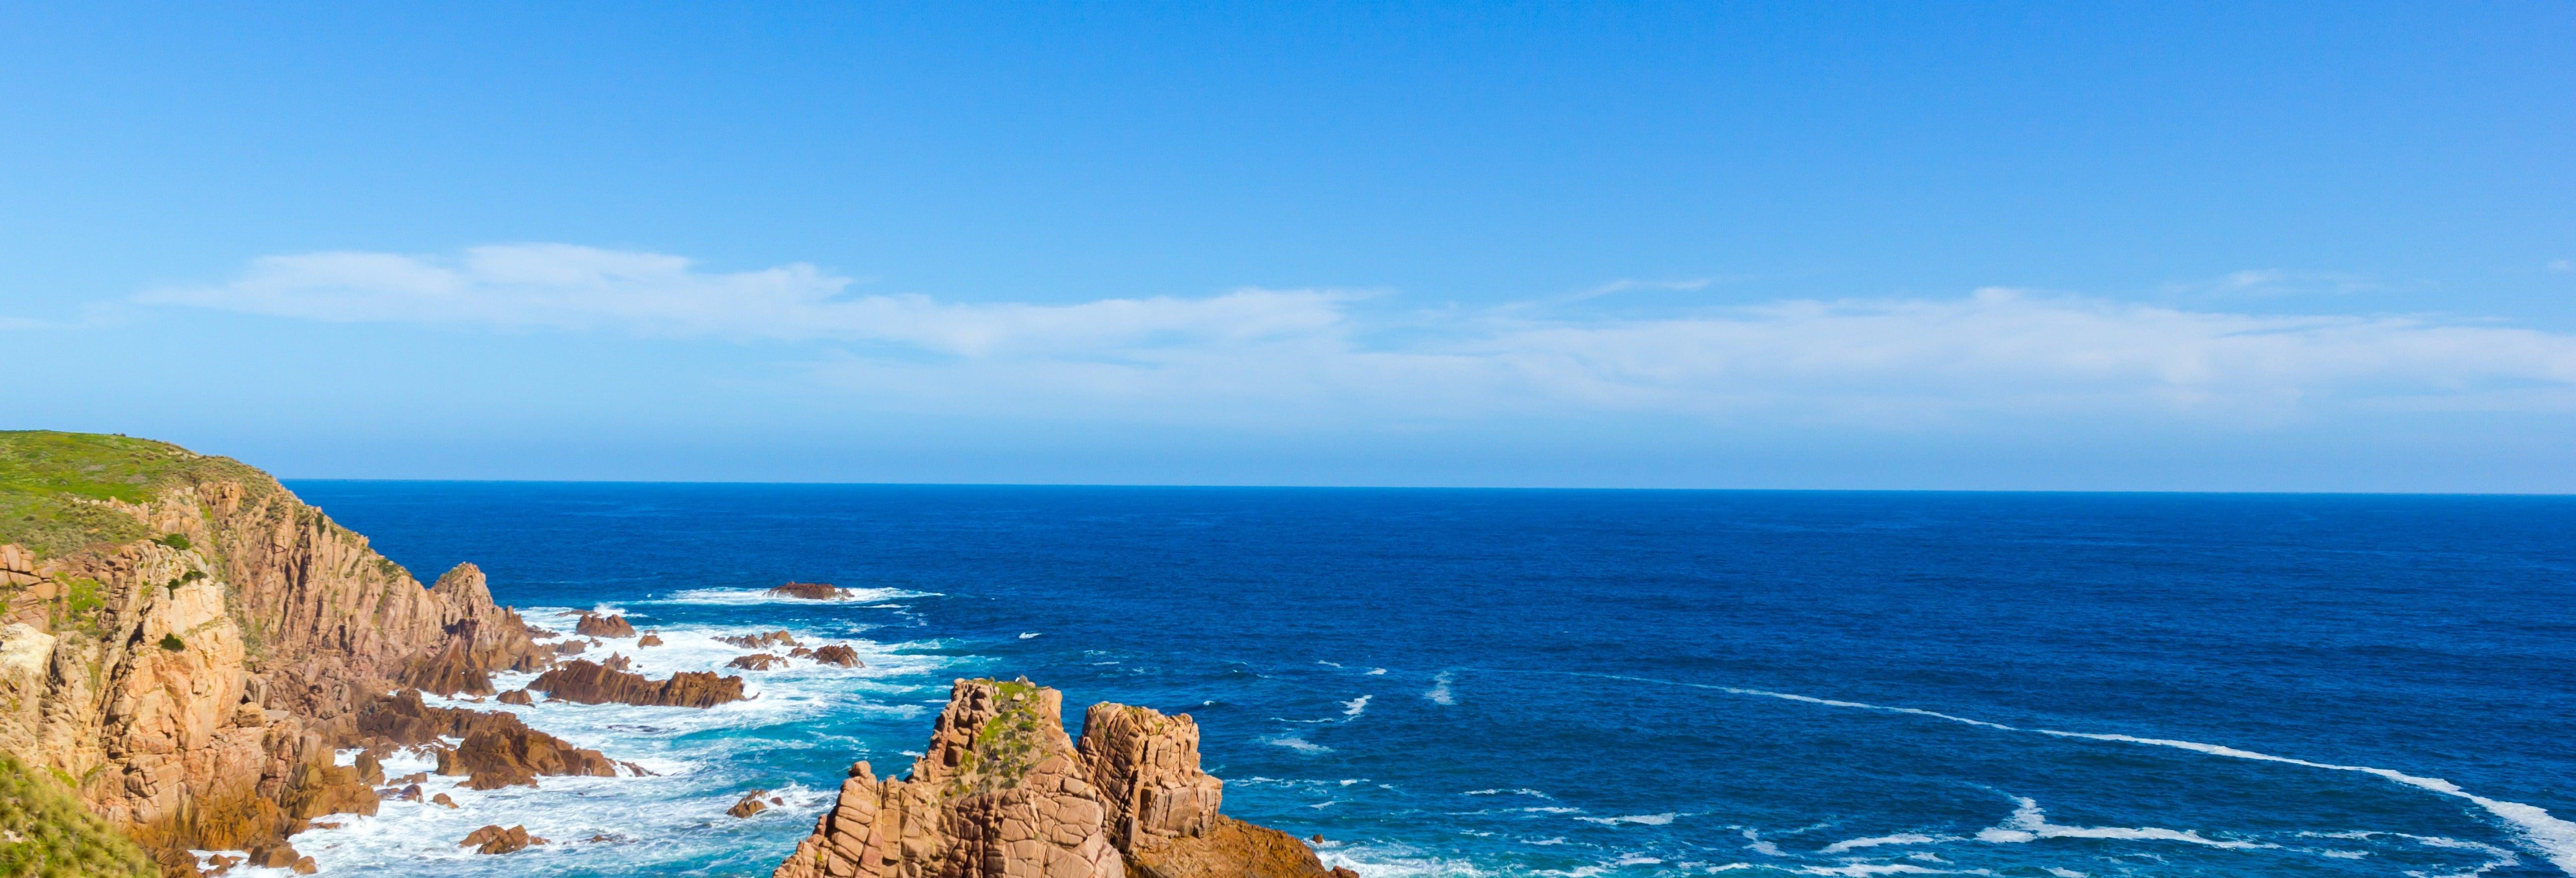 Passeio de barco pela Ilha Phillip